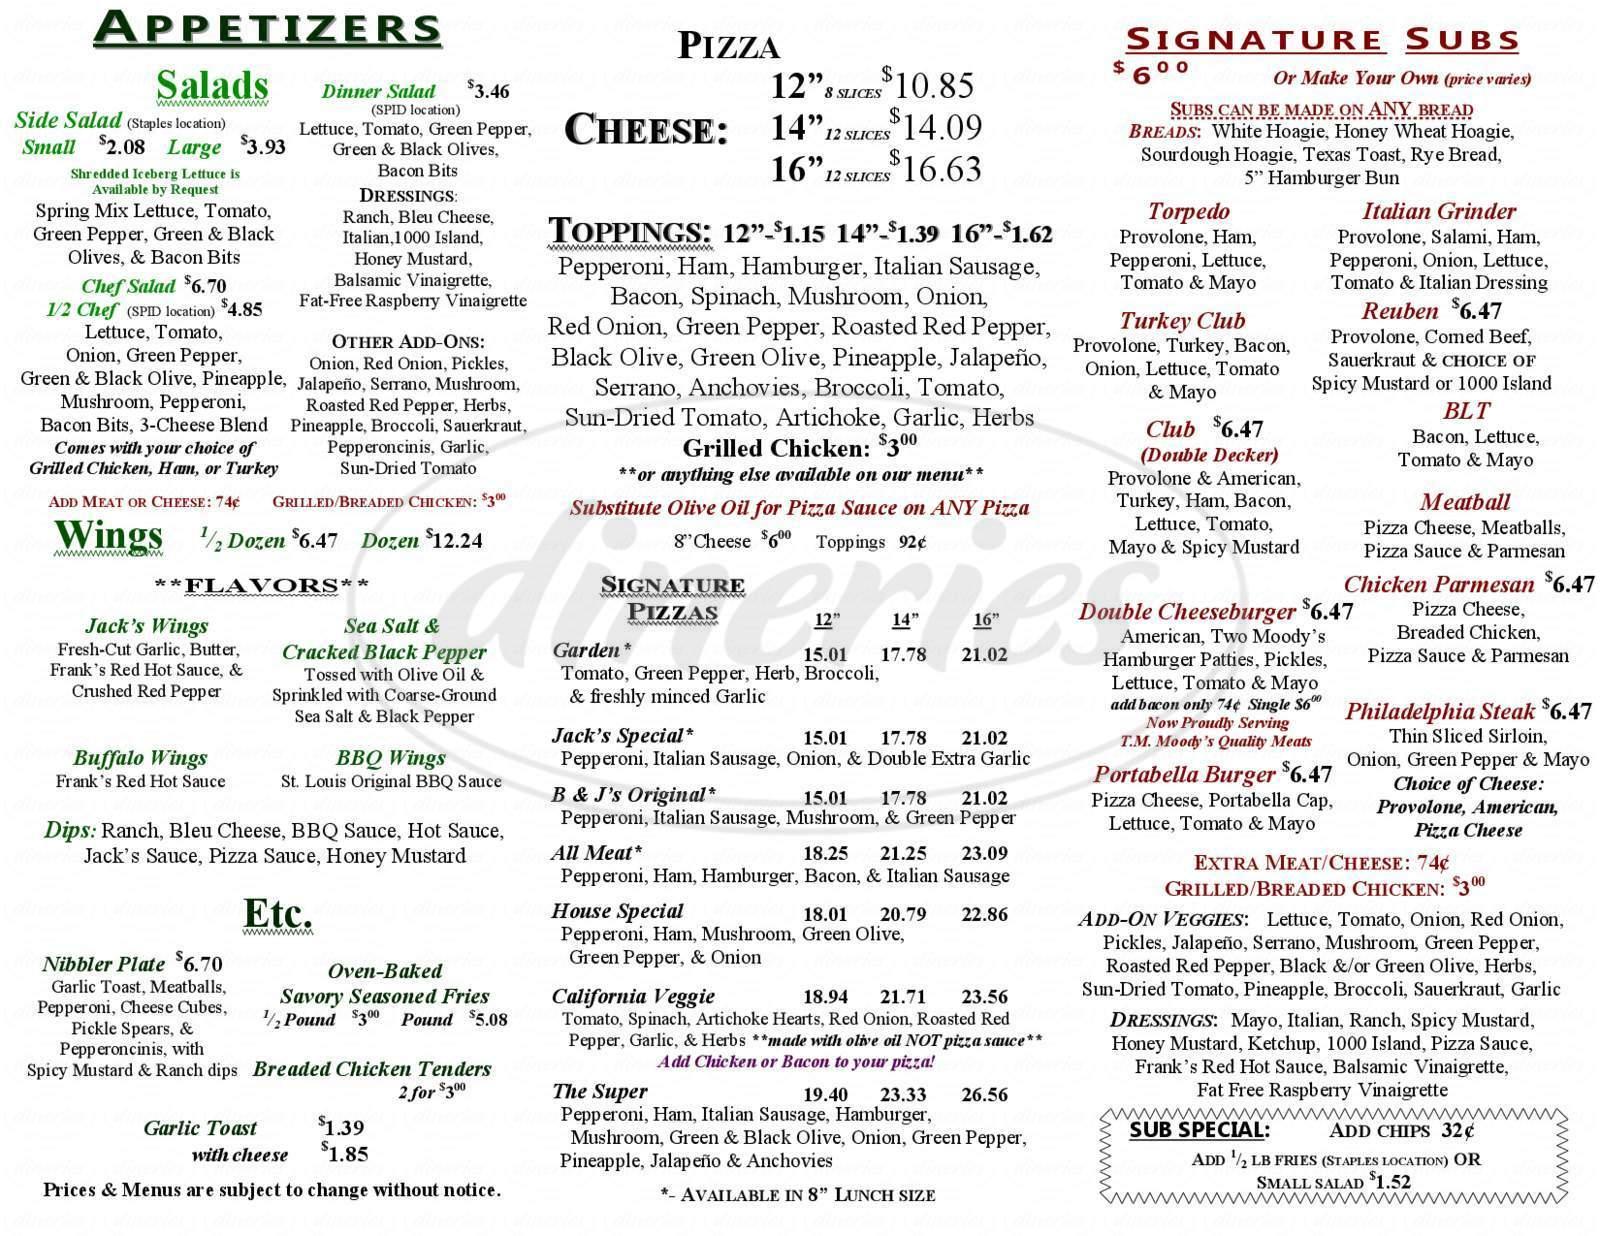 menu for B & J's Pizza